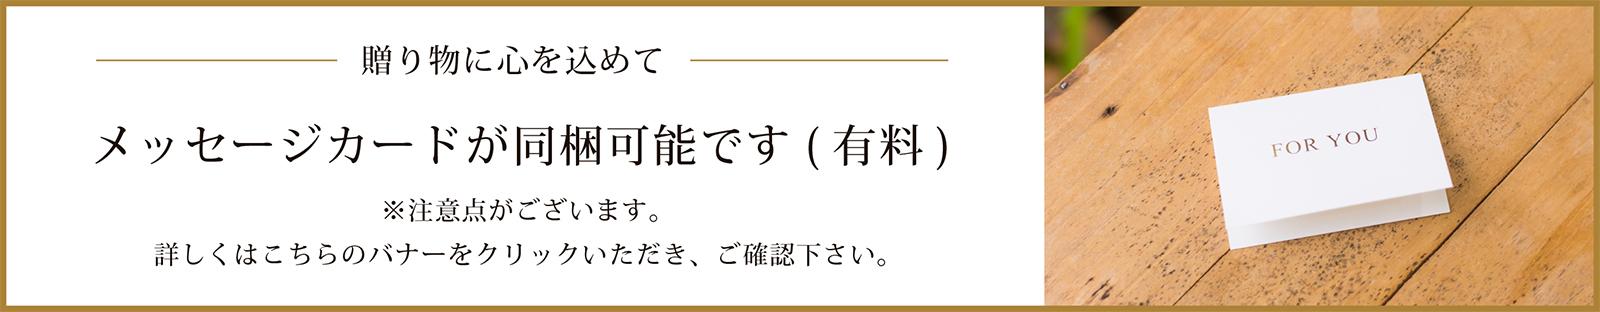 message_card_bnr